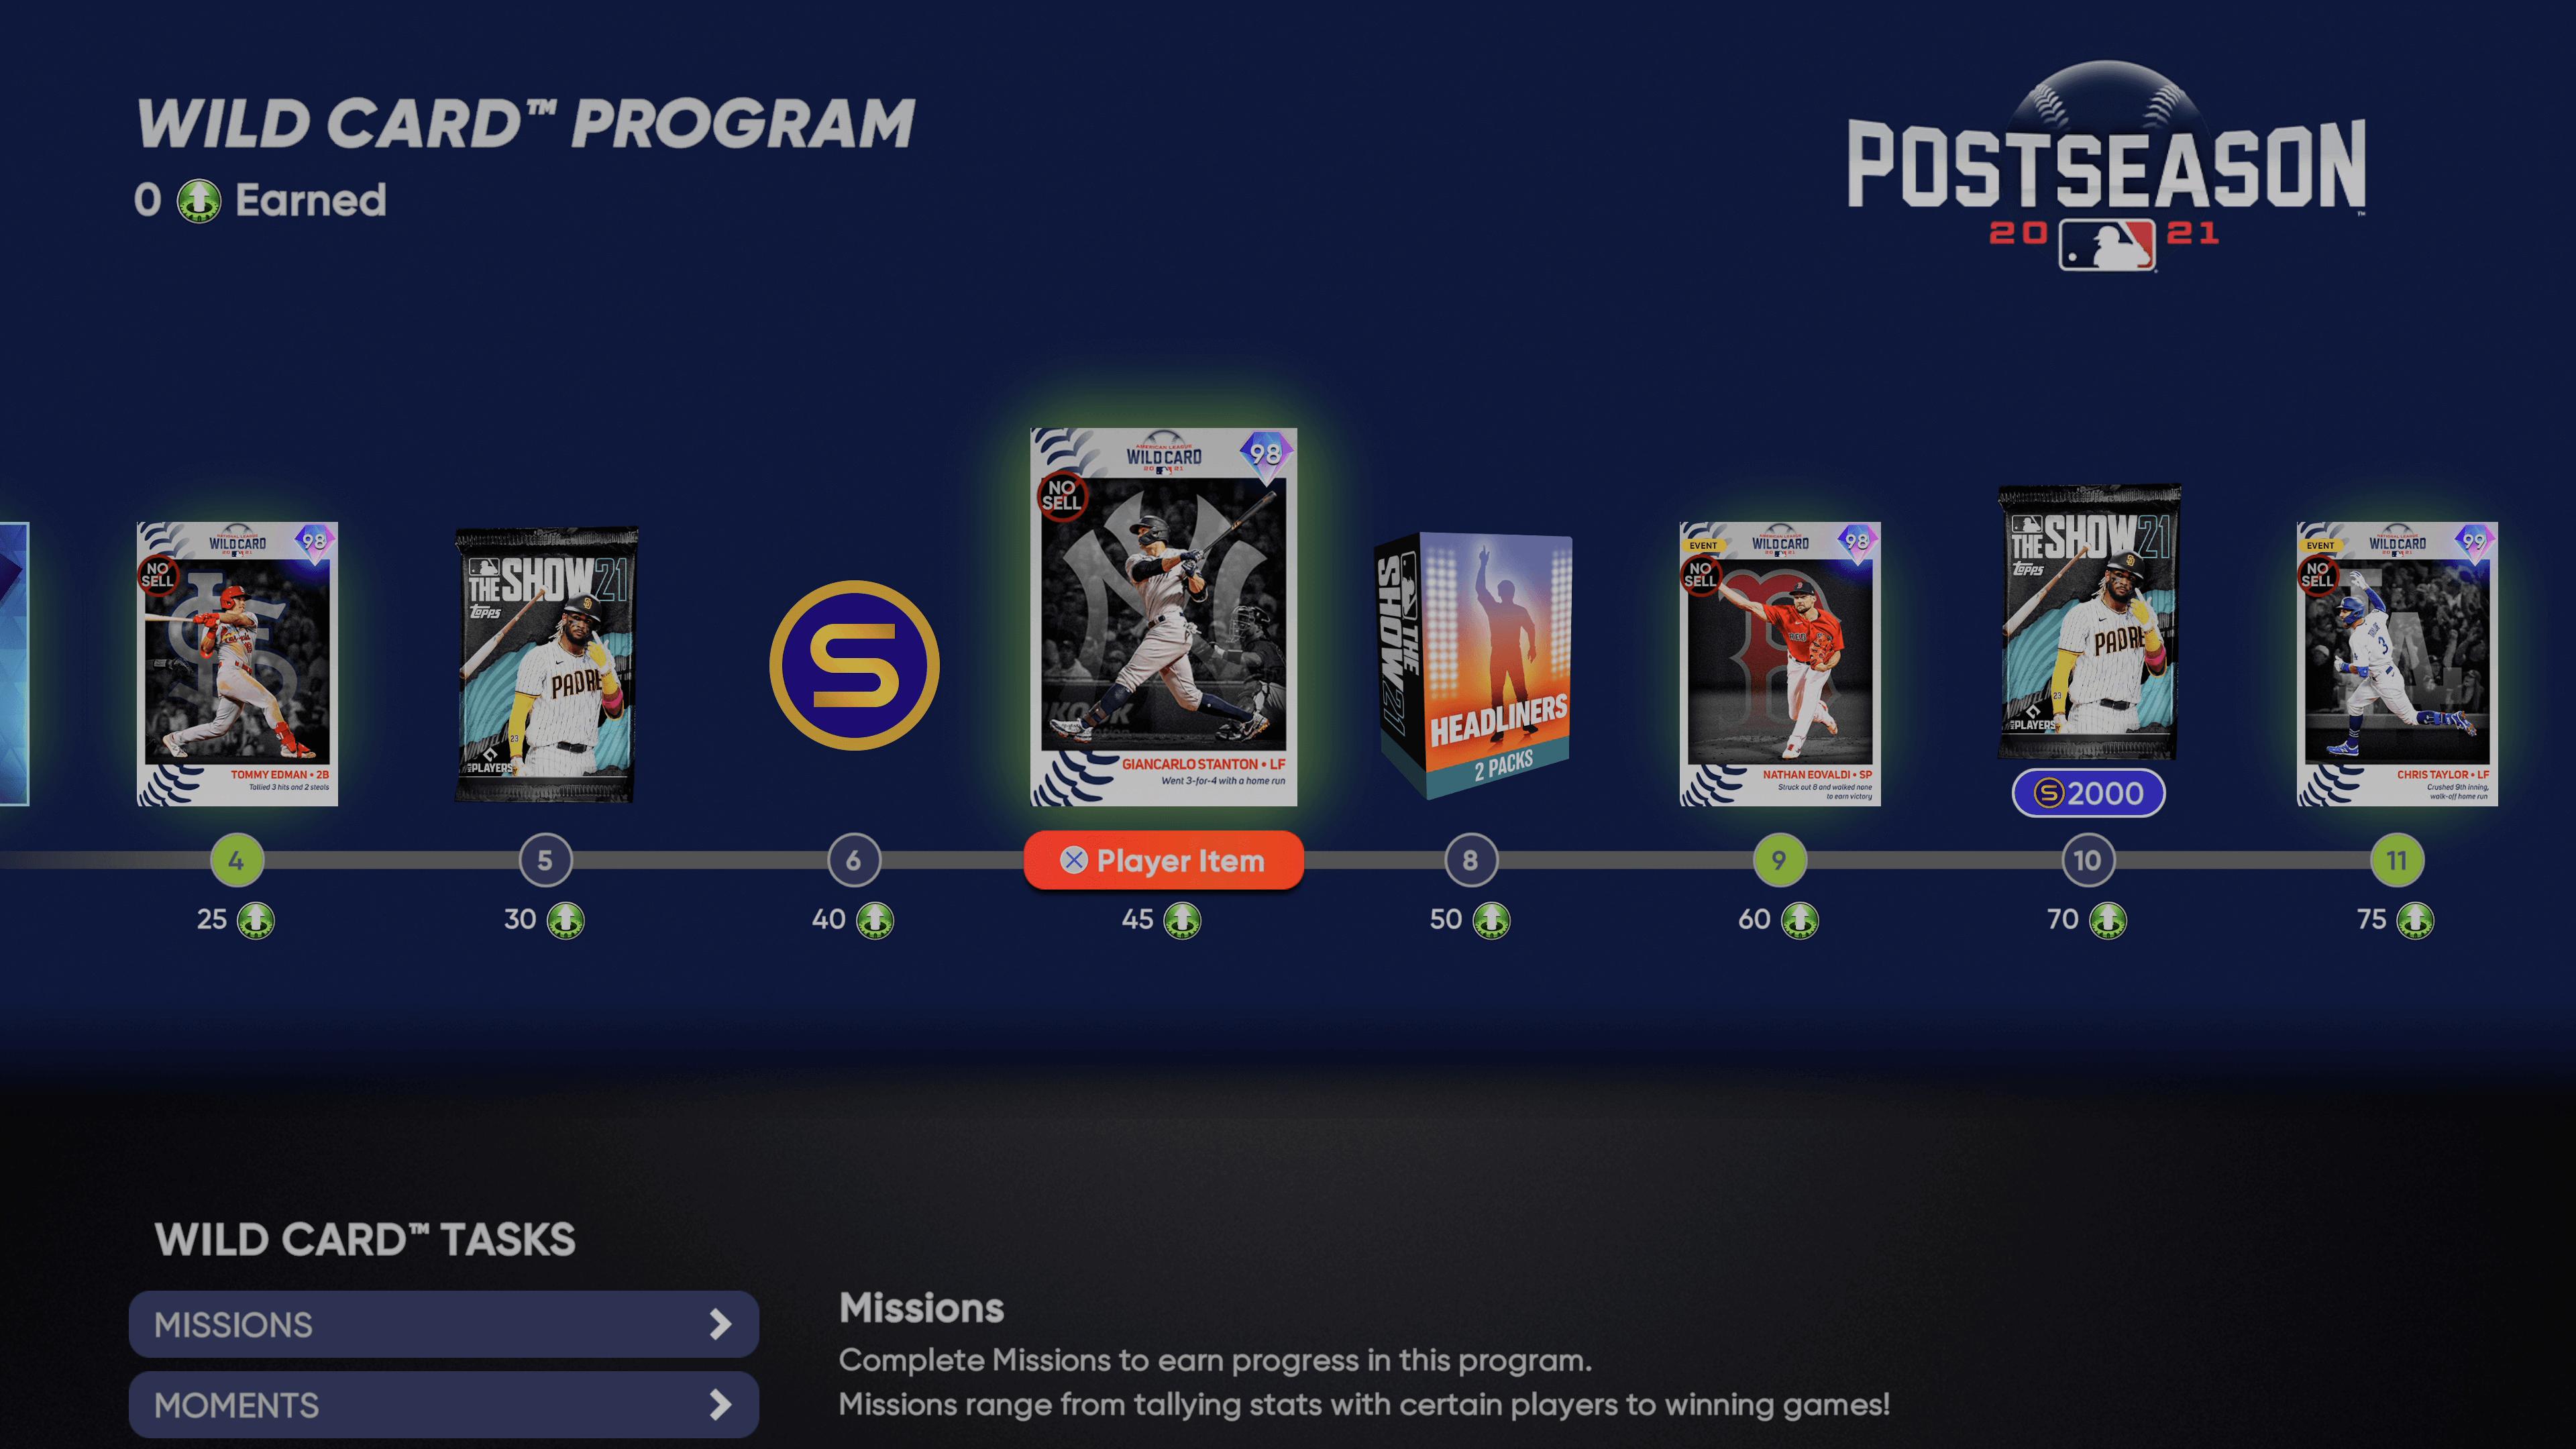 MLB The Show 21 - Wild Card Postseason Program_2021-10-08_15-07-41